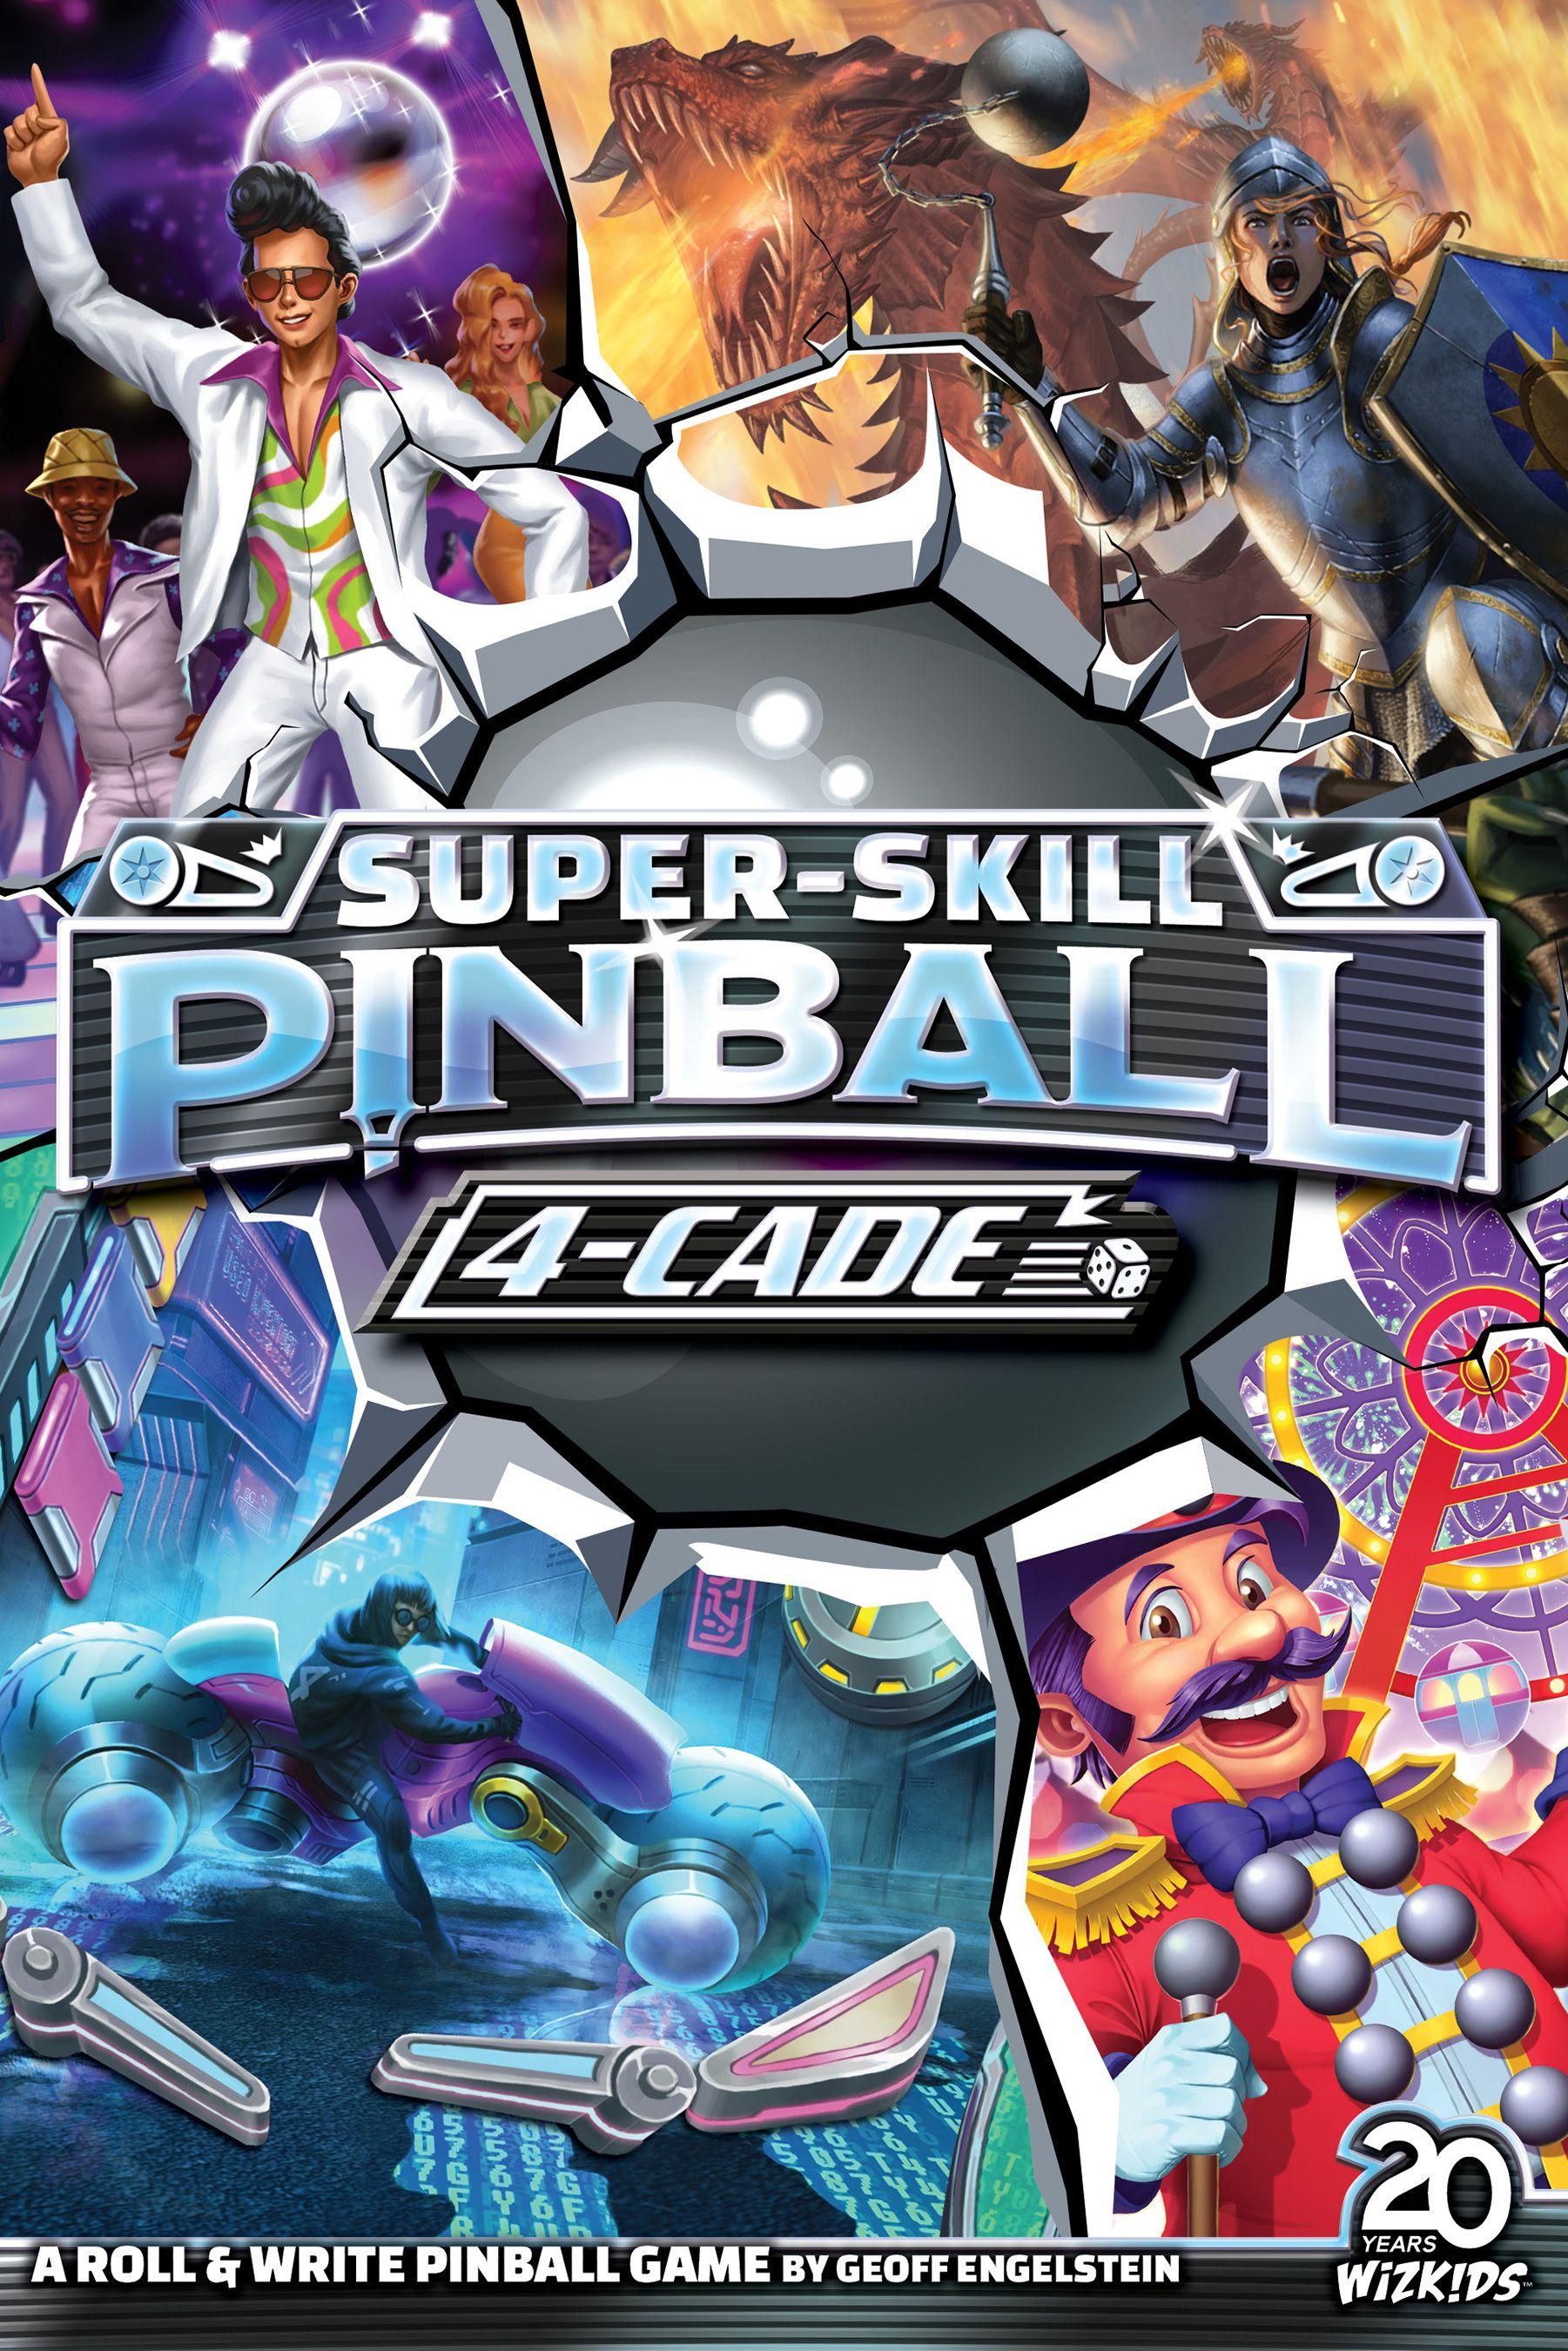 Super-Skill Pinball: 4-Cade